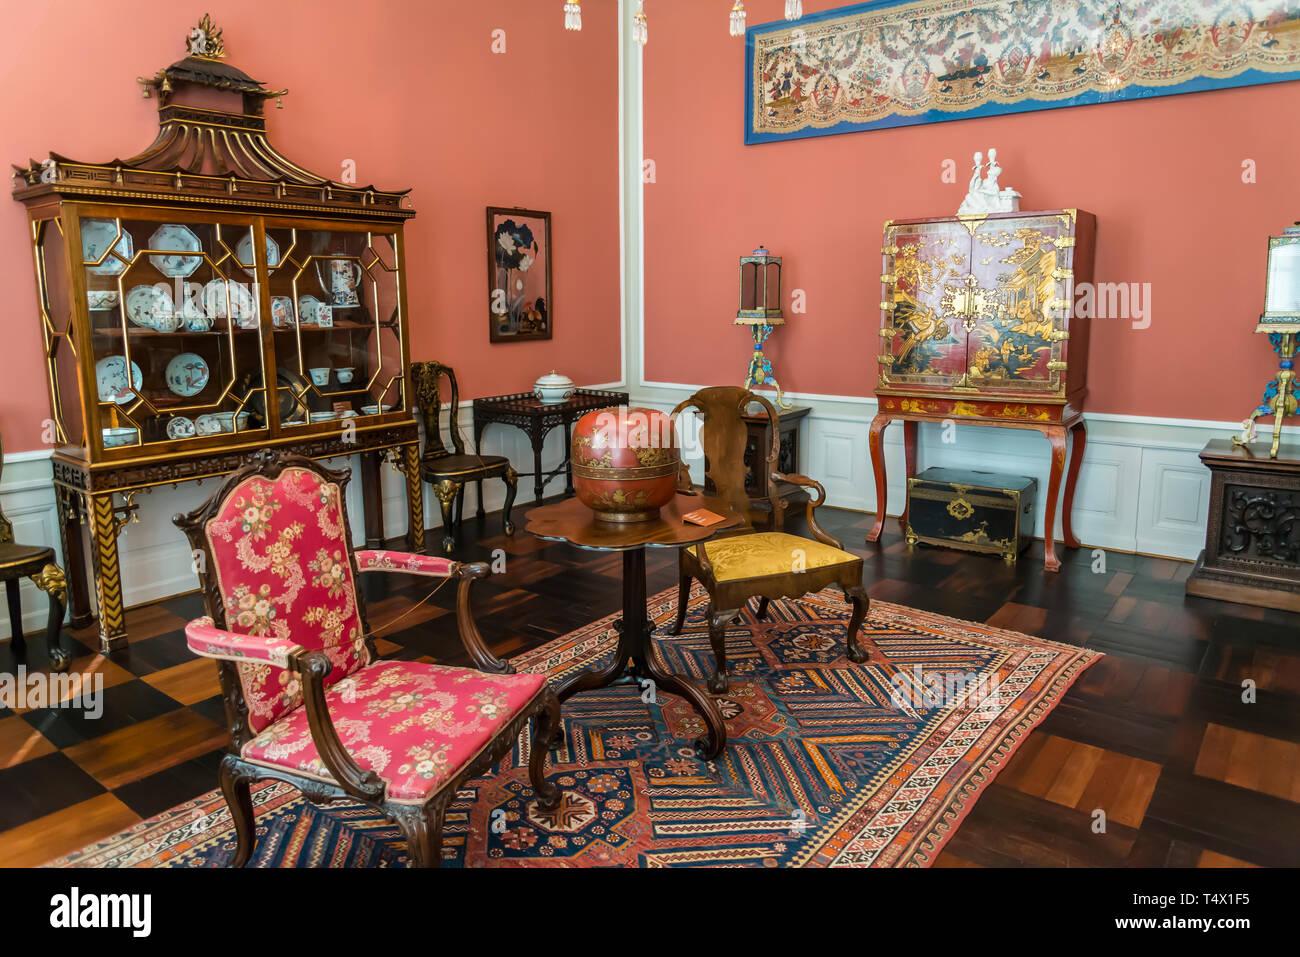 The David Collection A Museum Of Fine And Applied Art 19th Century Posh Interior Copenhagen Denmark Stock Photo Alamy